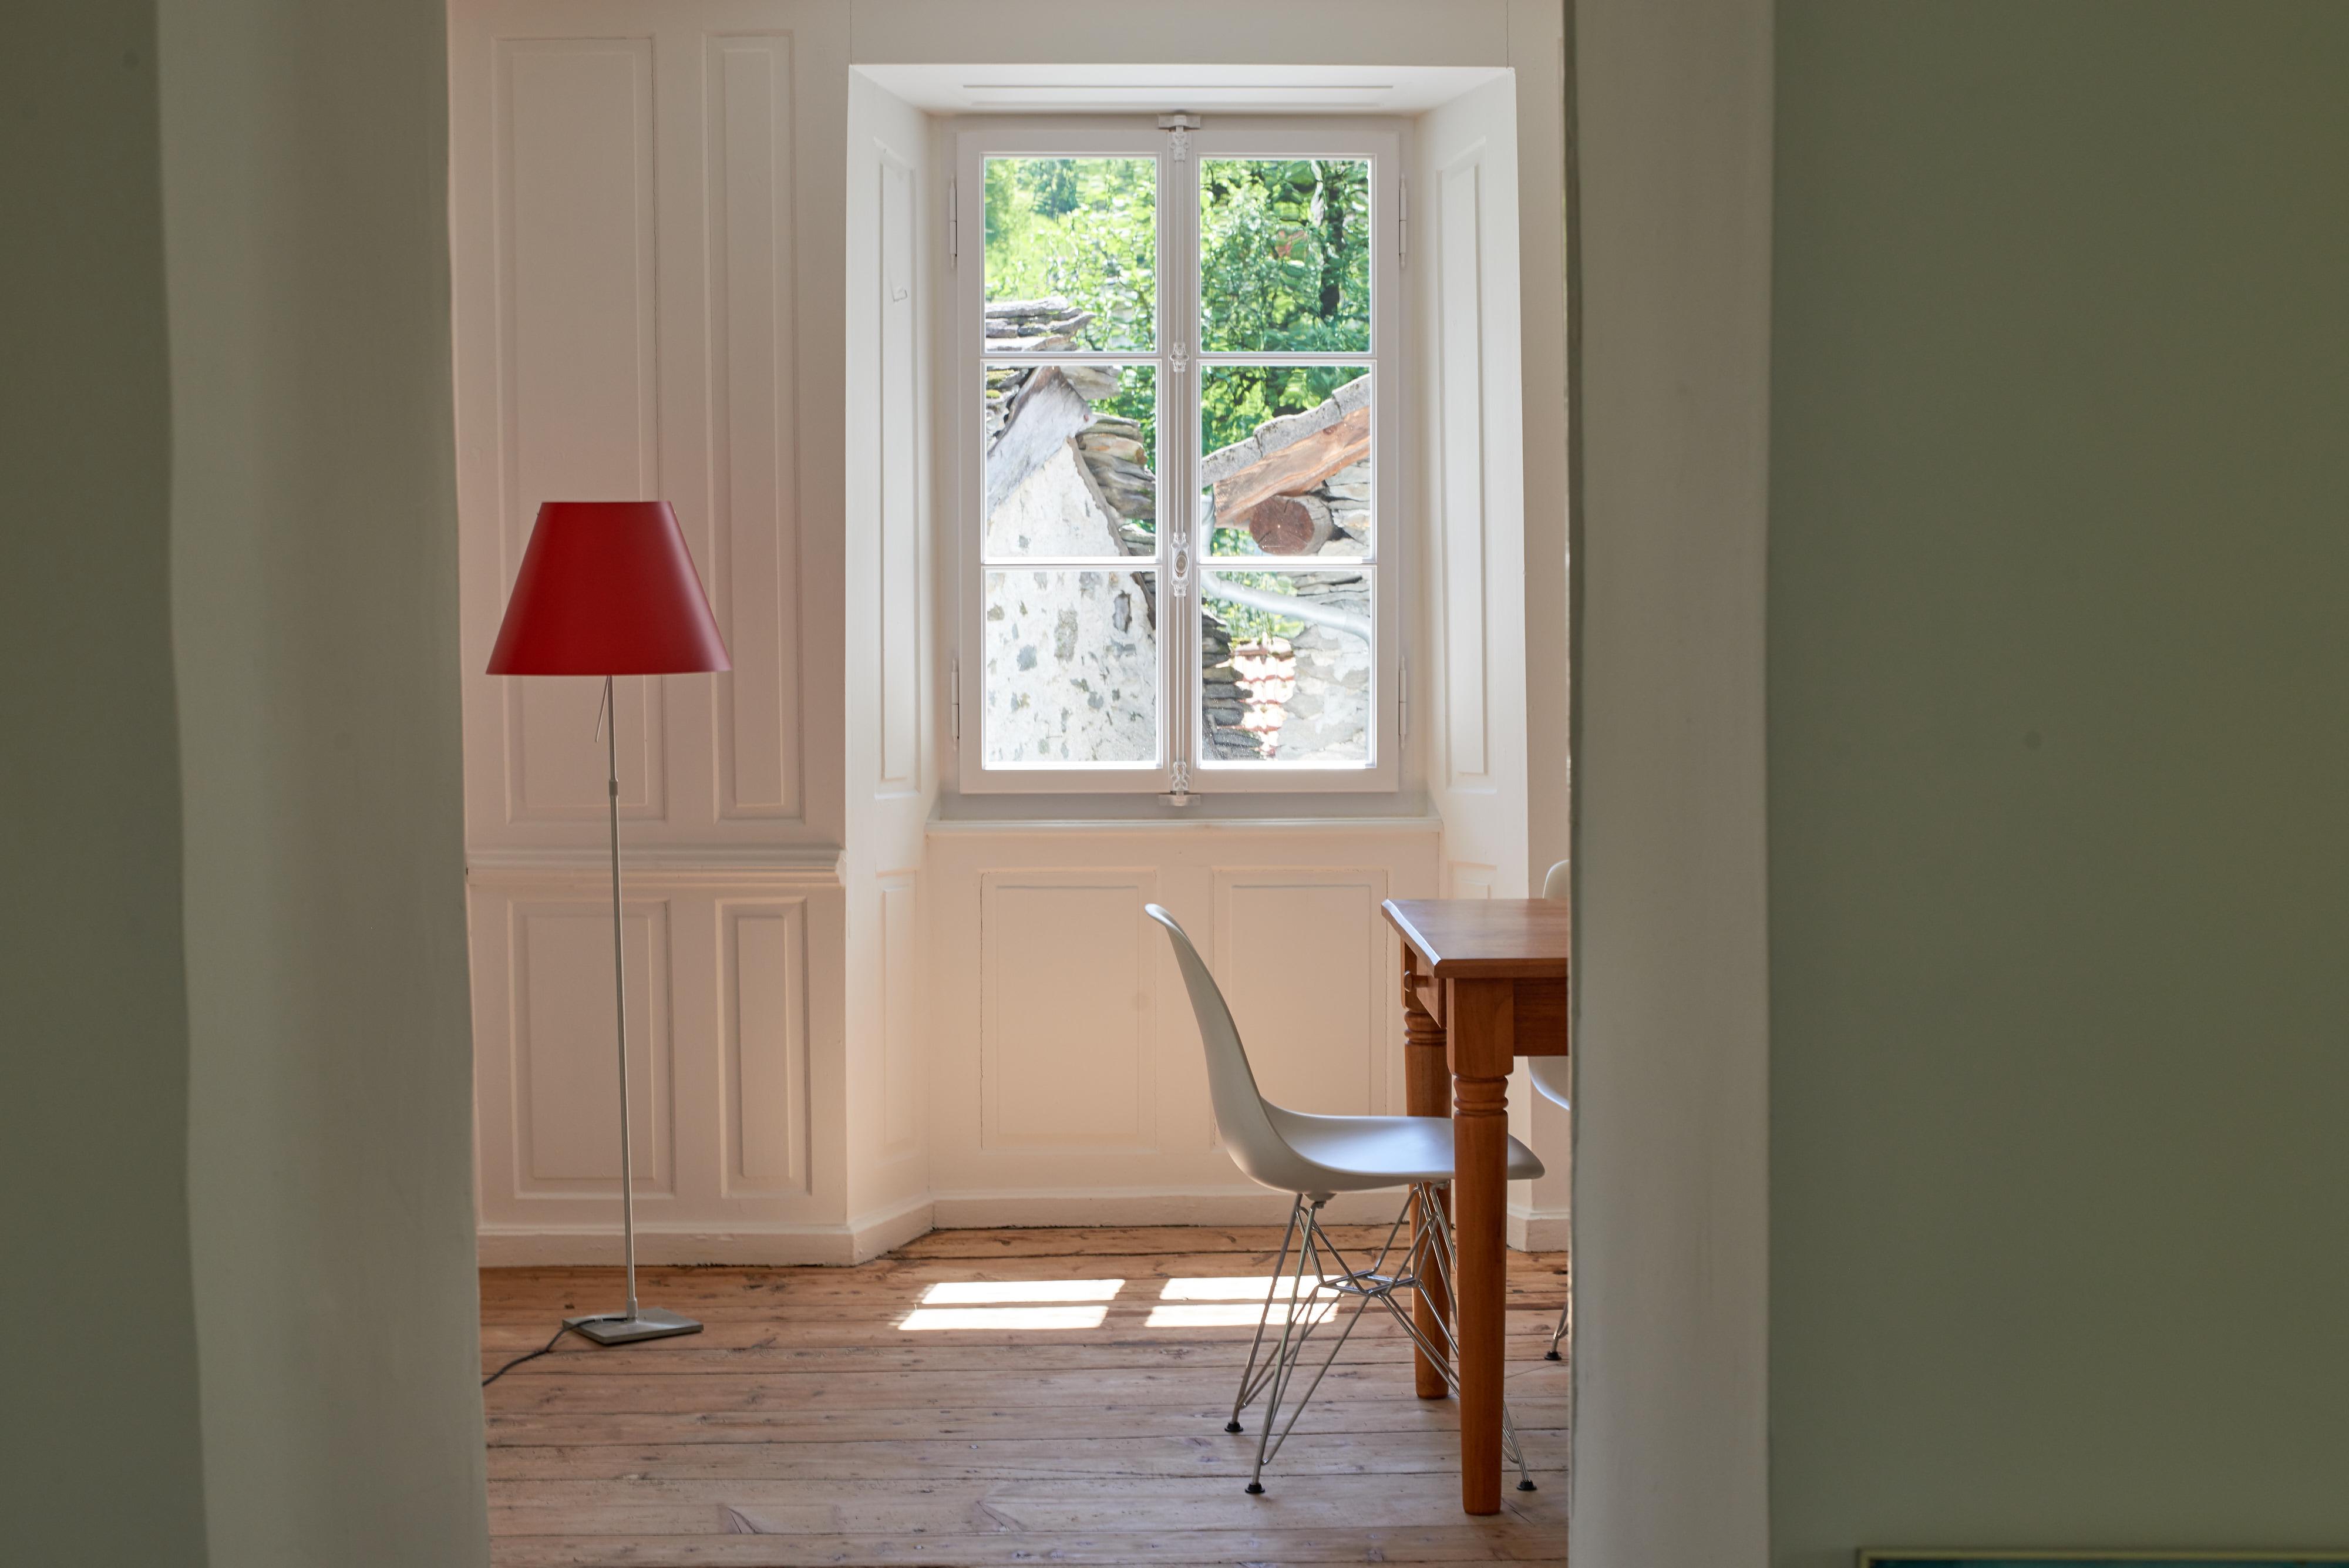 ferienhaus-soazza_DSC_4665